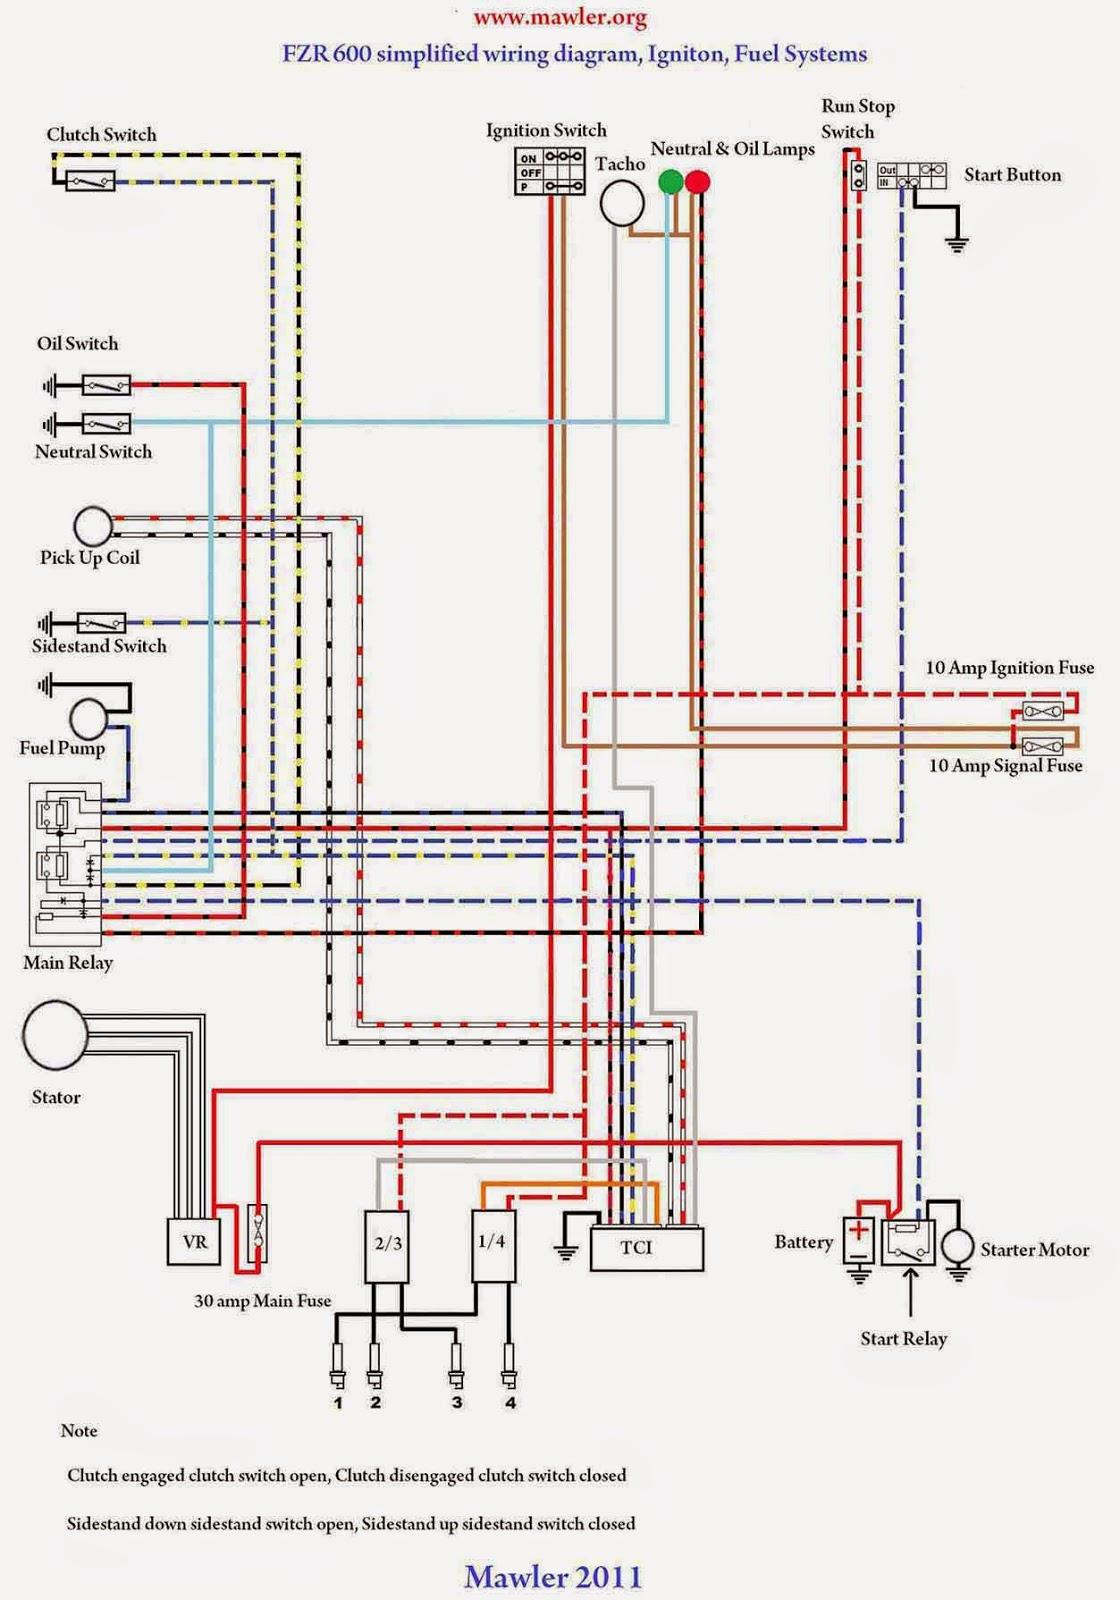 yamaha fzr600 wiring diagram - Wiring Diagram